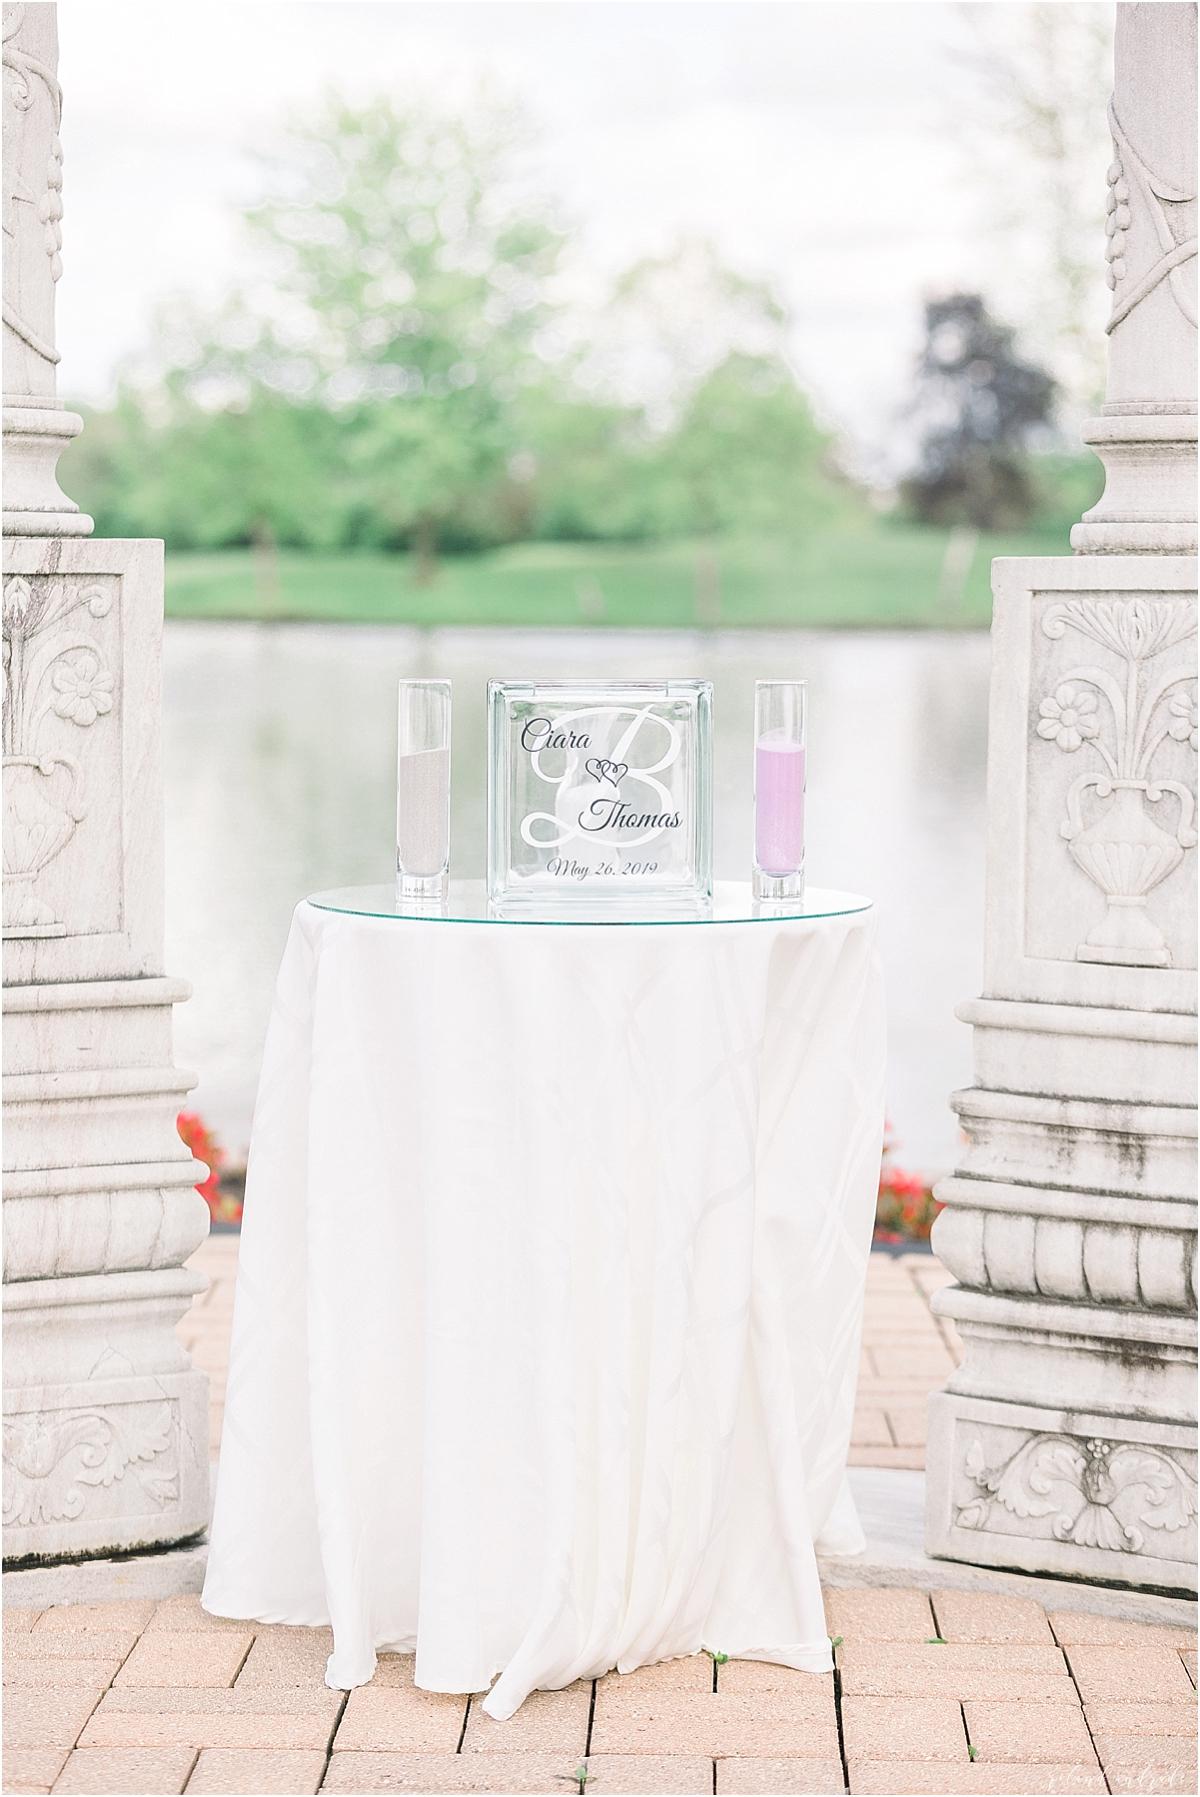 The Odyssey Wedding, Tinley Park Wedding, Chicago Wedding Photographer, Best Photographer In Tineley Park, Best Photographer In Chicago, Light And Airy Photographer_0010.jpg